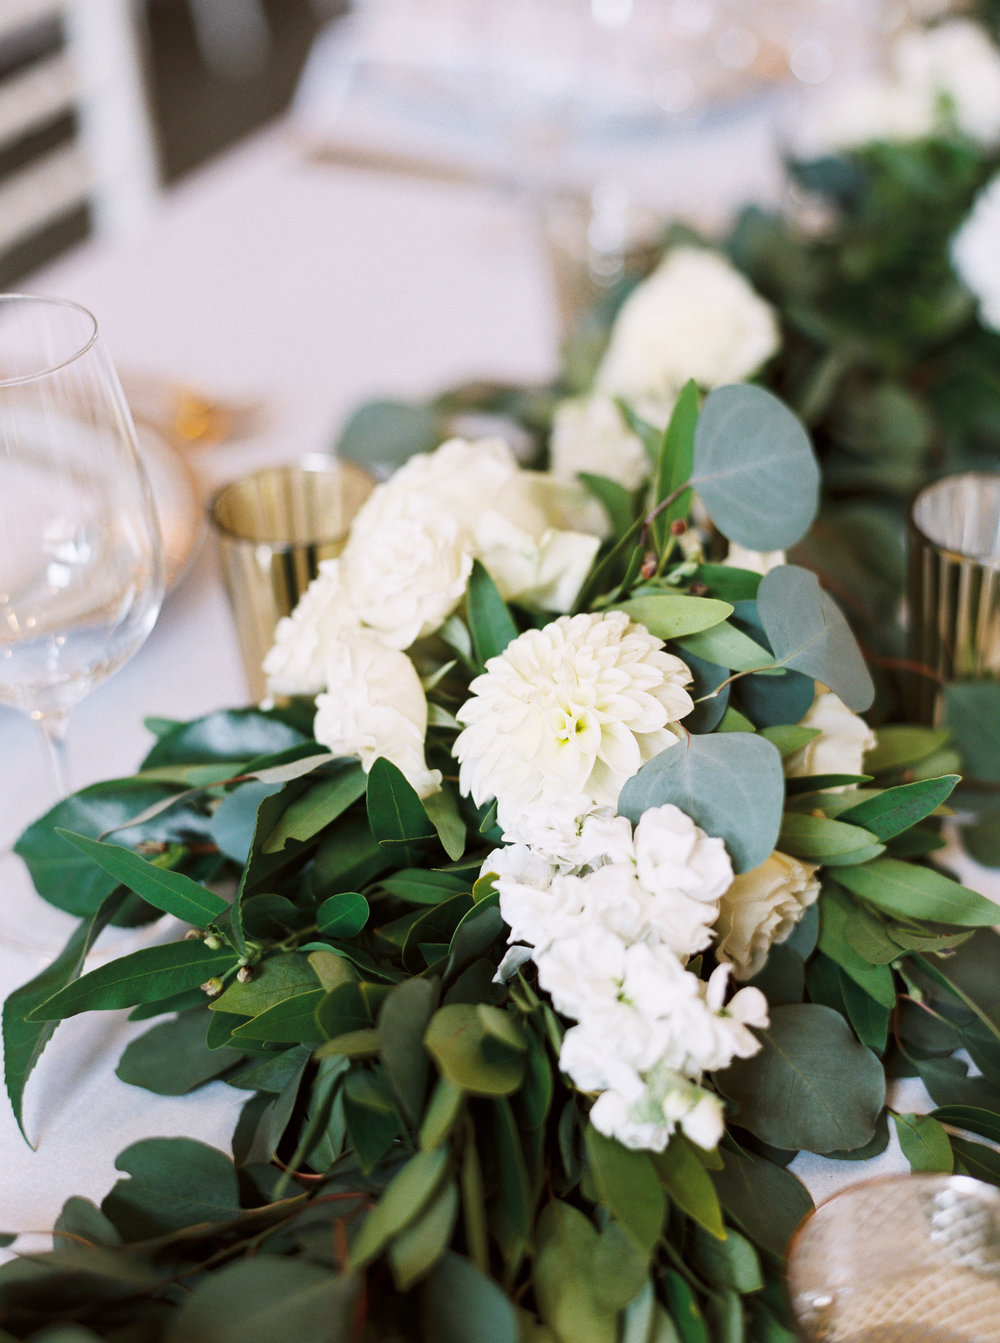 intimate-wedding-at-solage-calistoga-in-napa-177.jpg